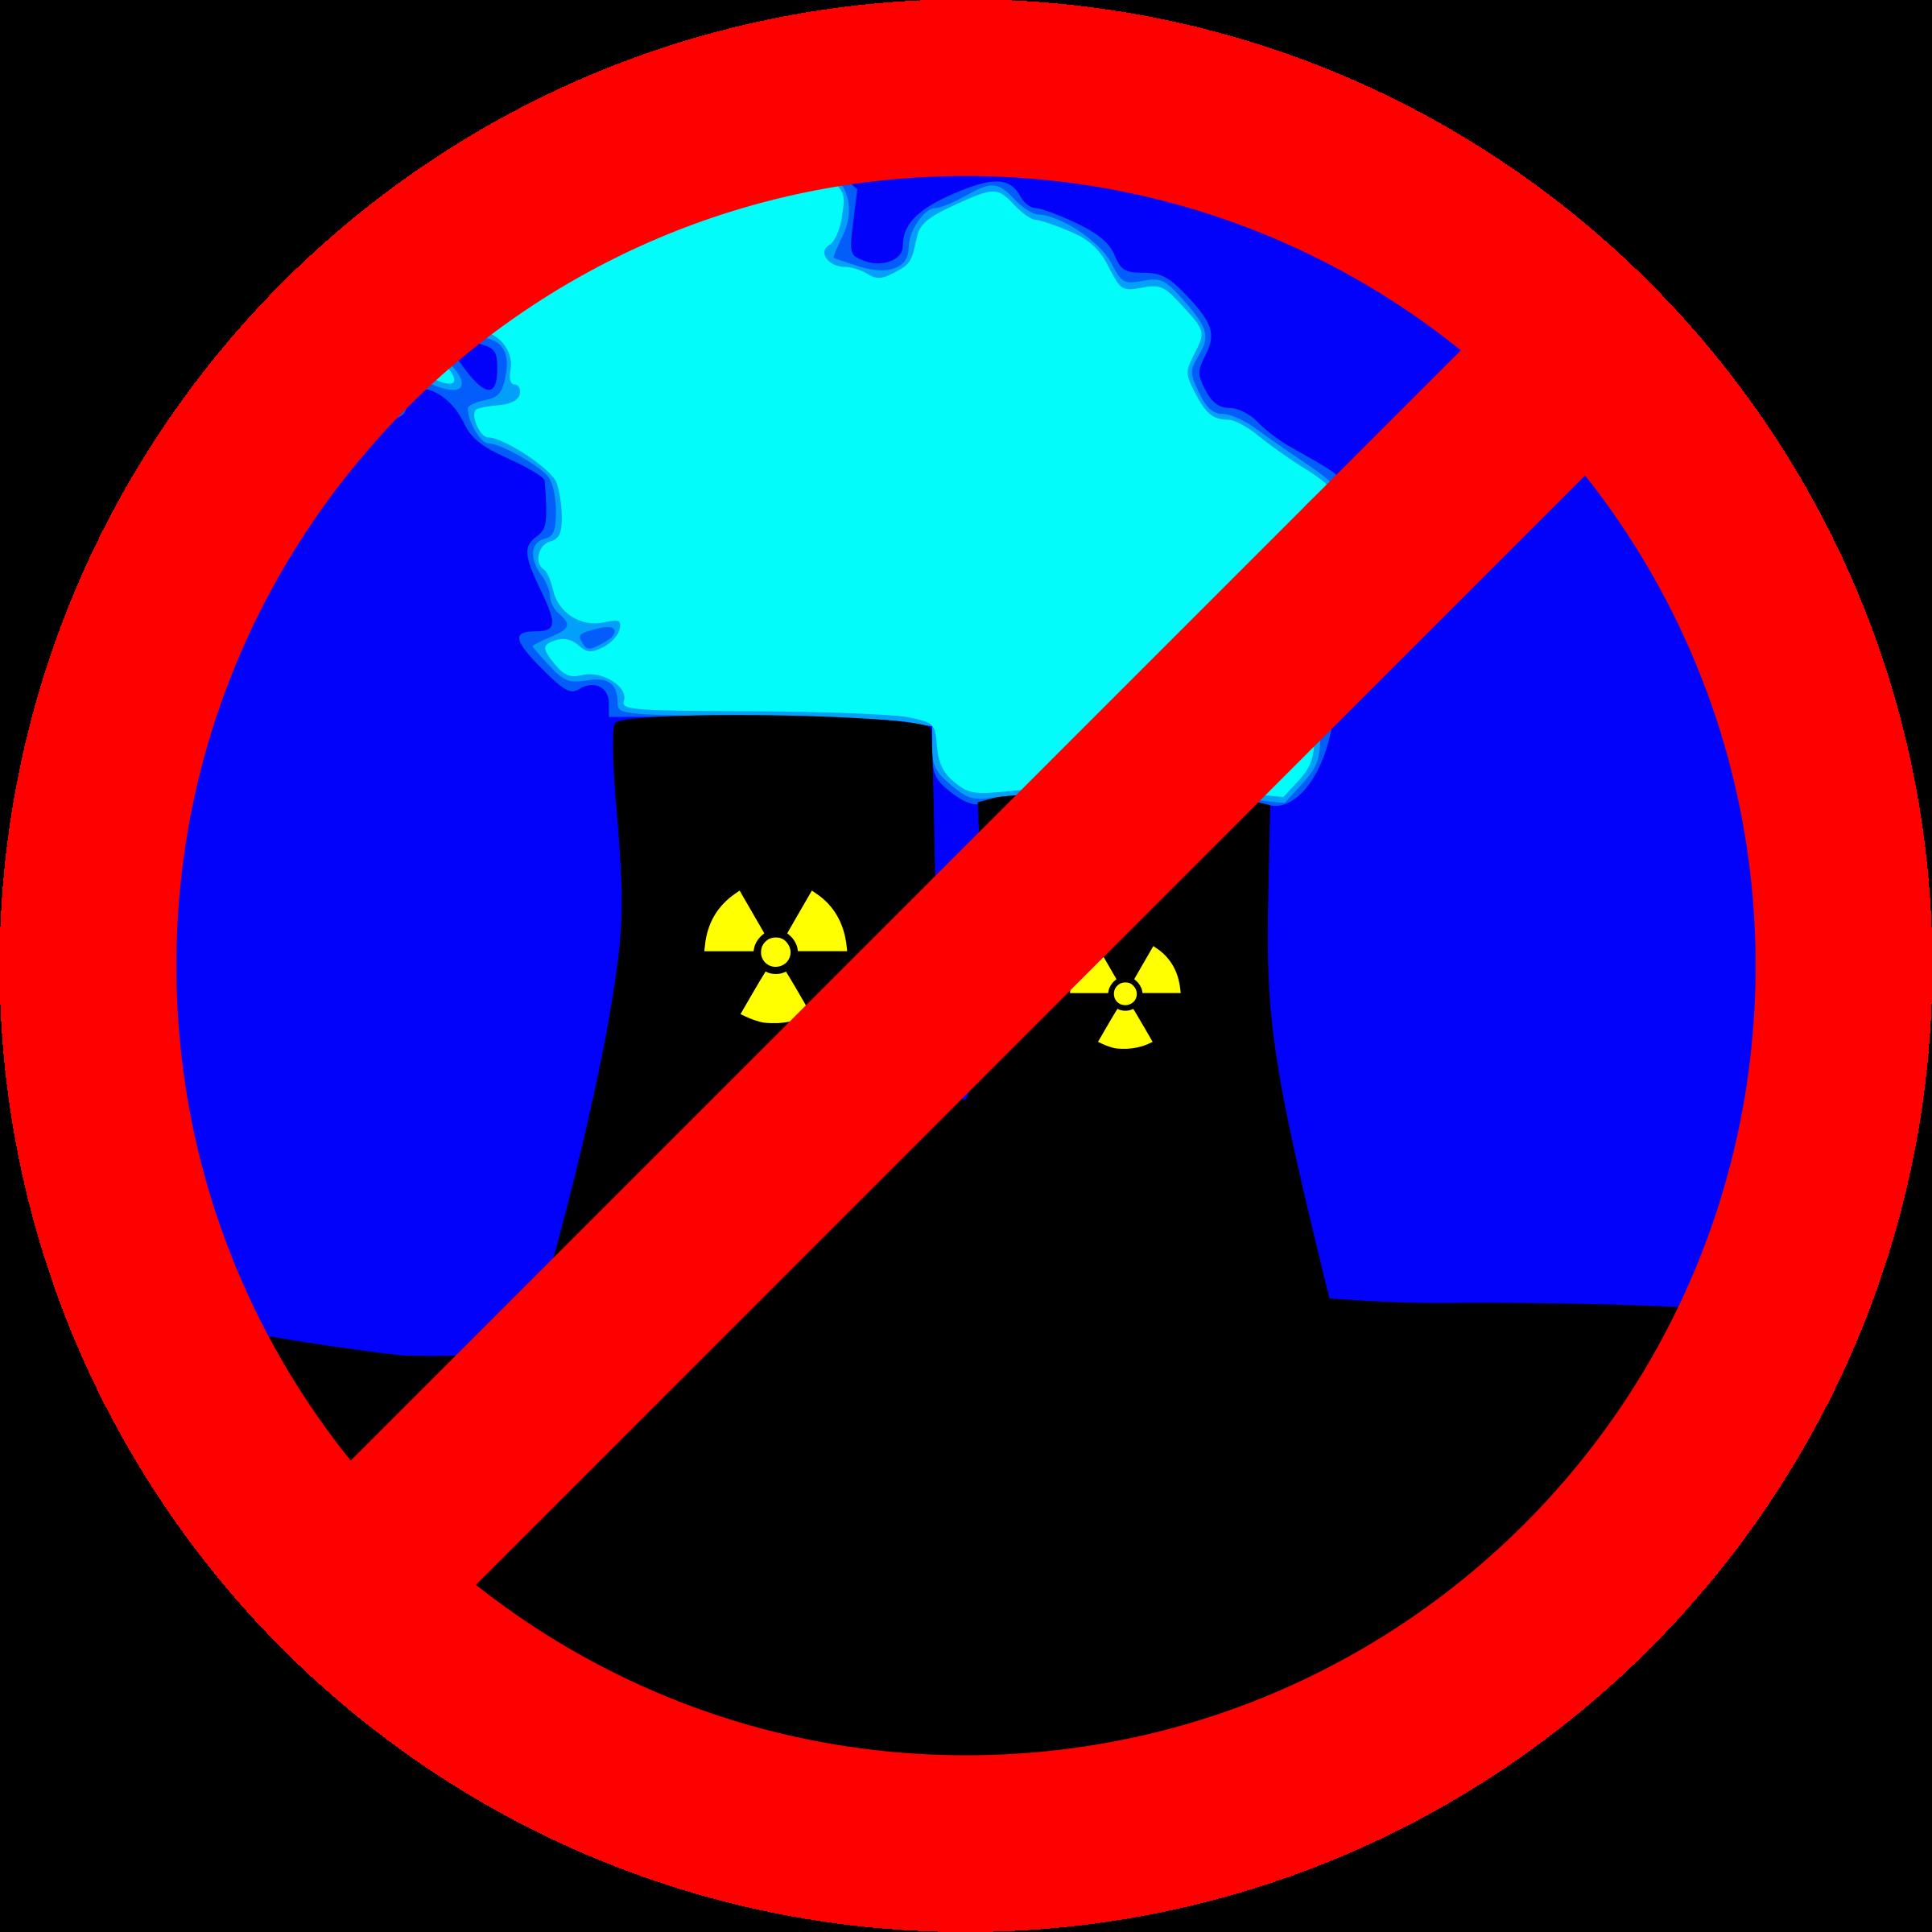 Nuclear power no thanks. Nuke clipart clip art